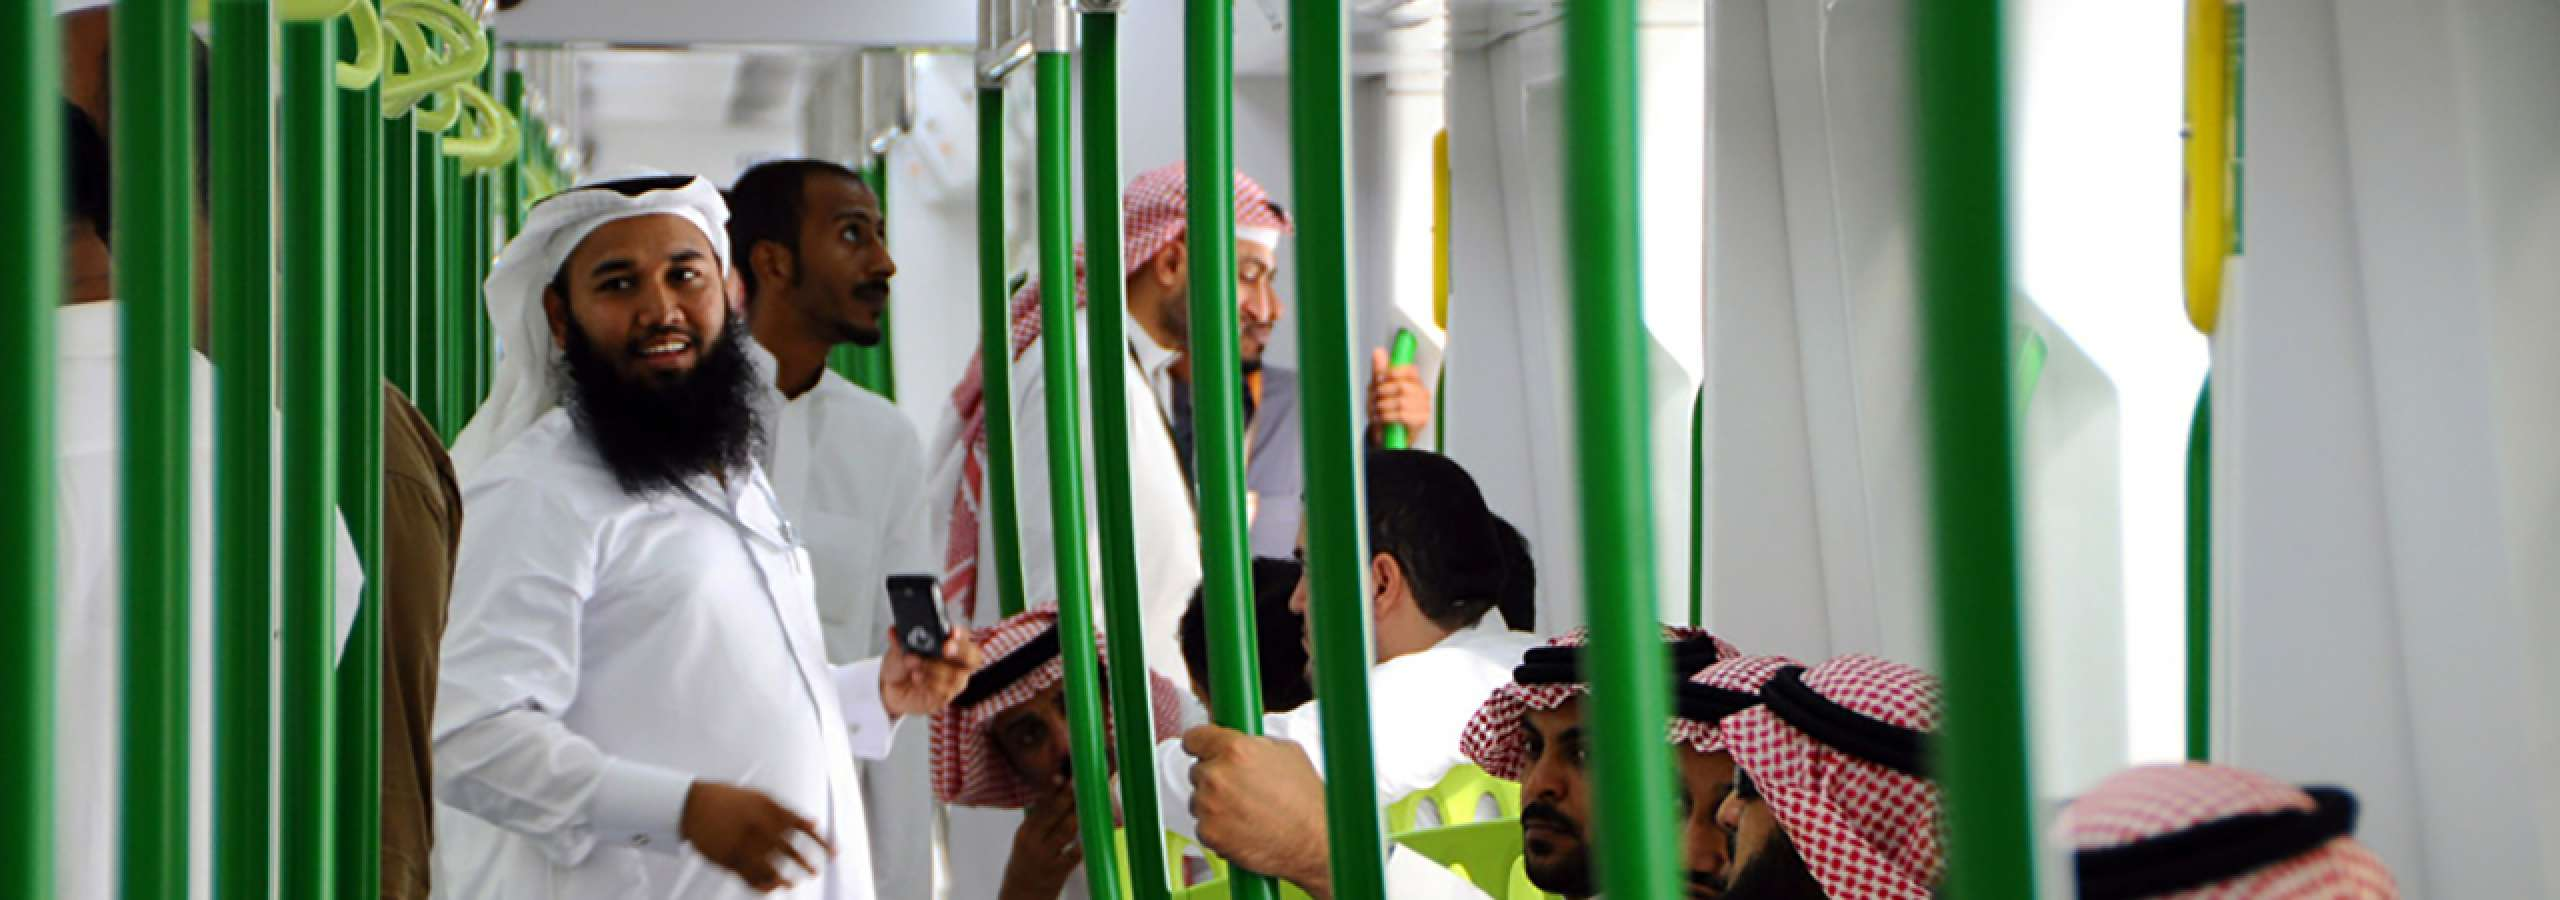 Mecca Metro, Mecca, Kingdom of Saudi Arabia